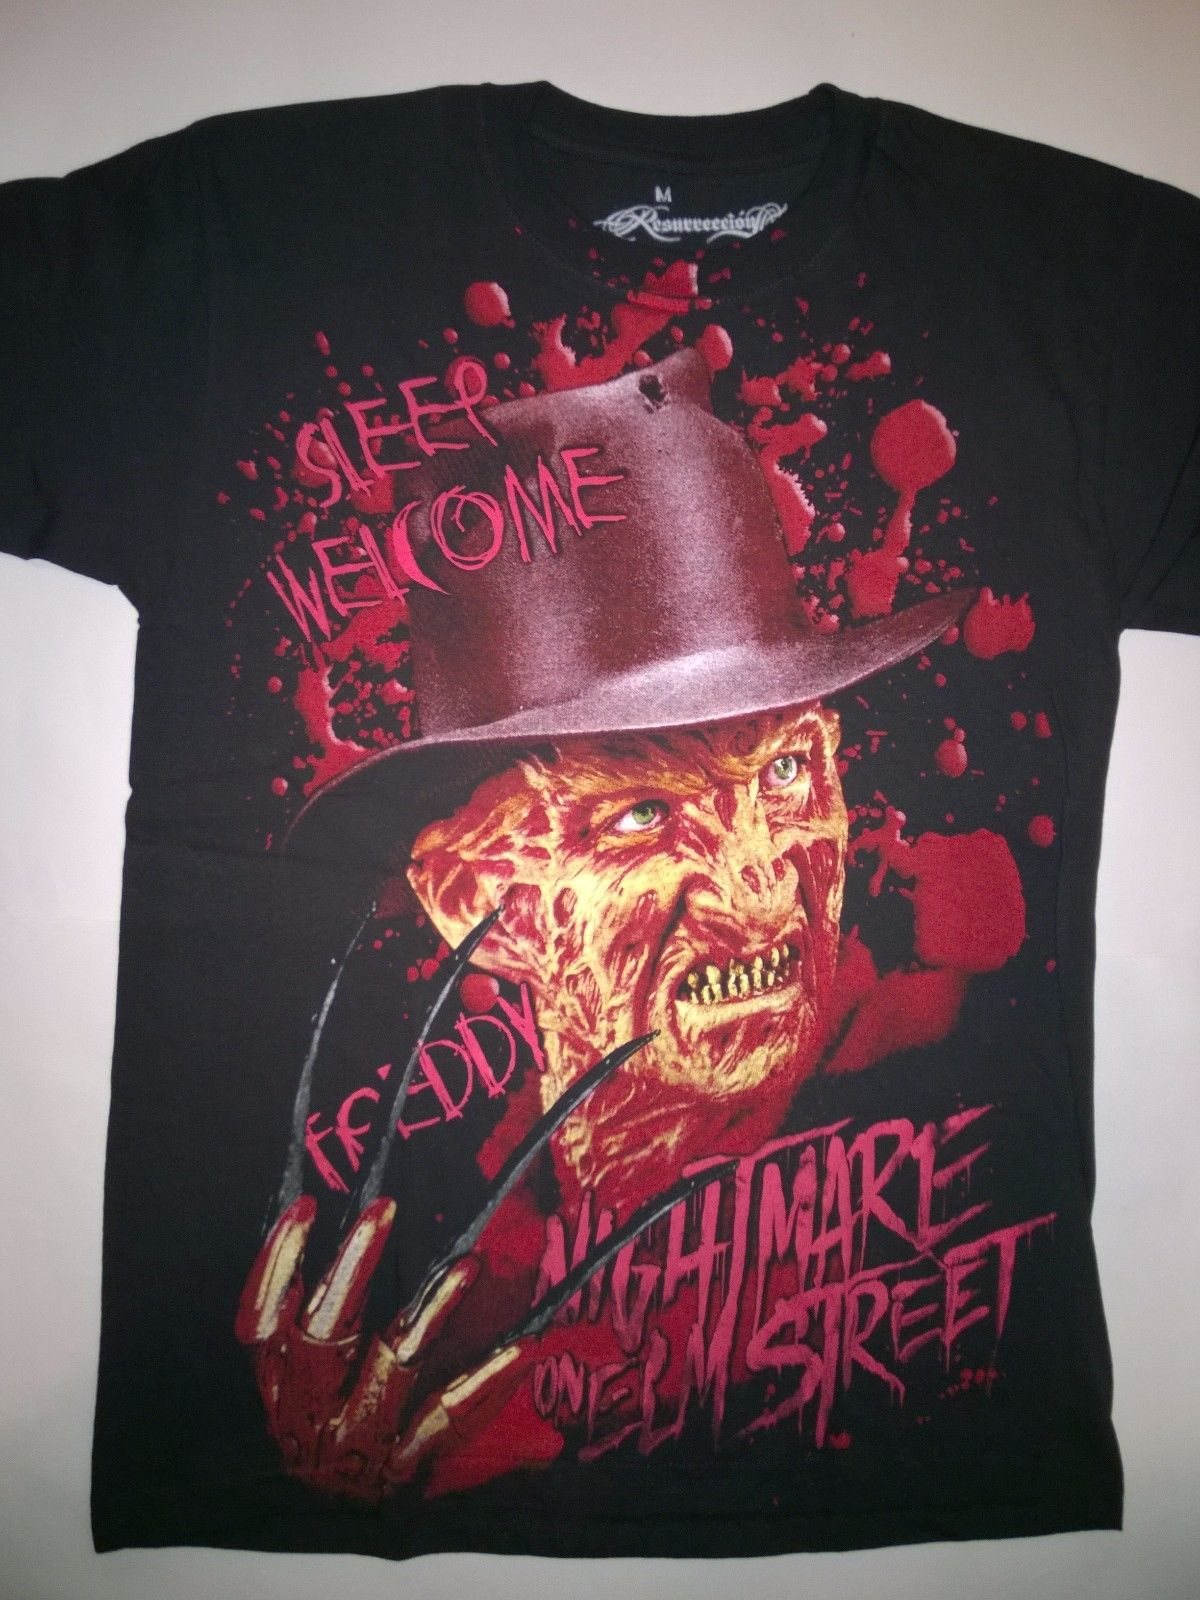 2d1cd976799 FREDDY KRUEGER T-Shirt Nightmare on Elm Street Halloween Friday13 Jason  Horror Sleeve Men T